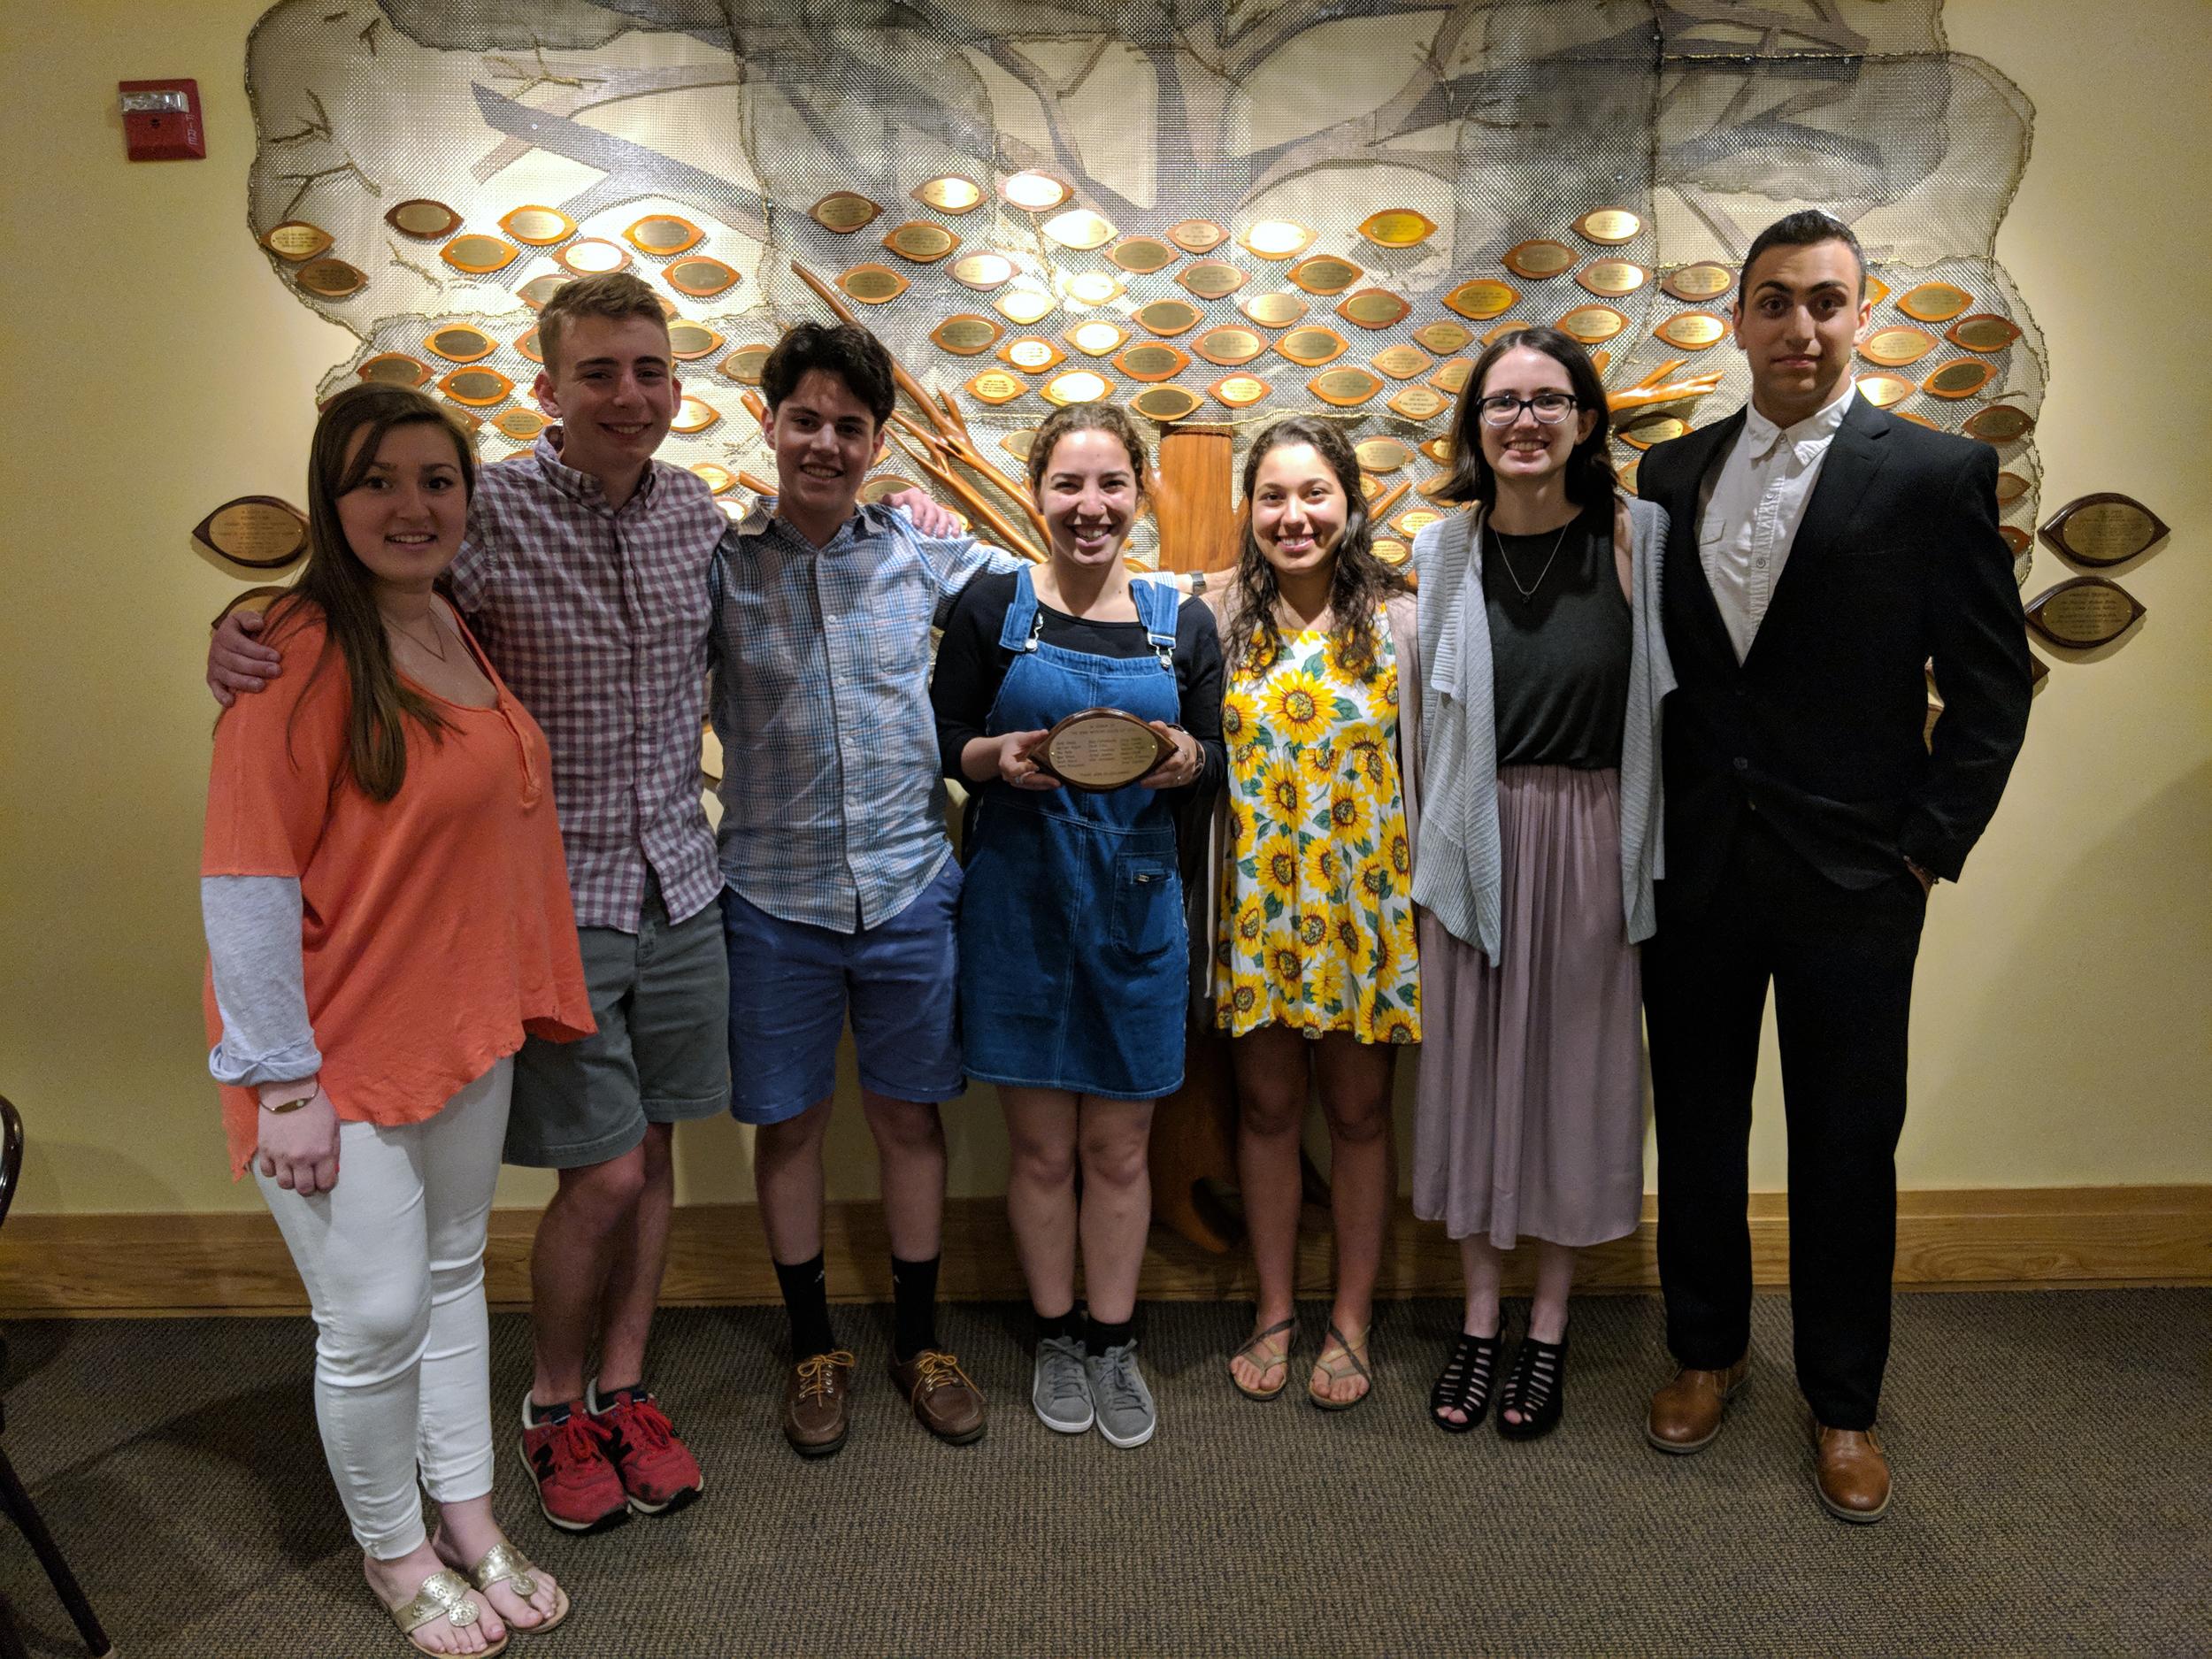 Graduation Shabbat - Honoring the class of 2018